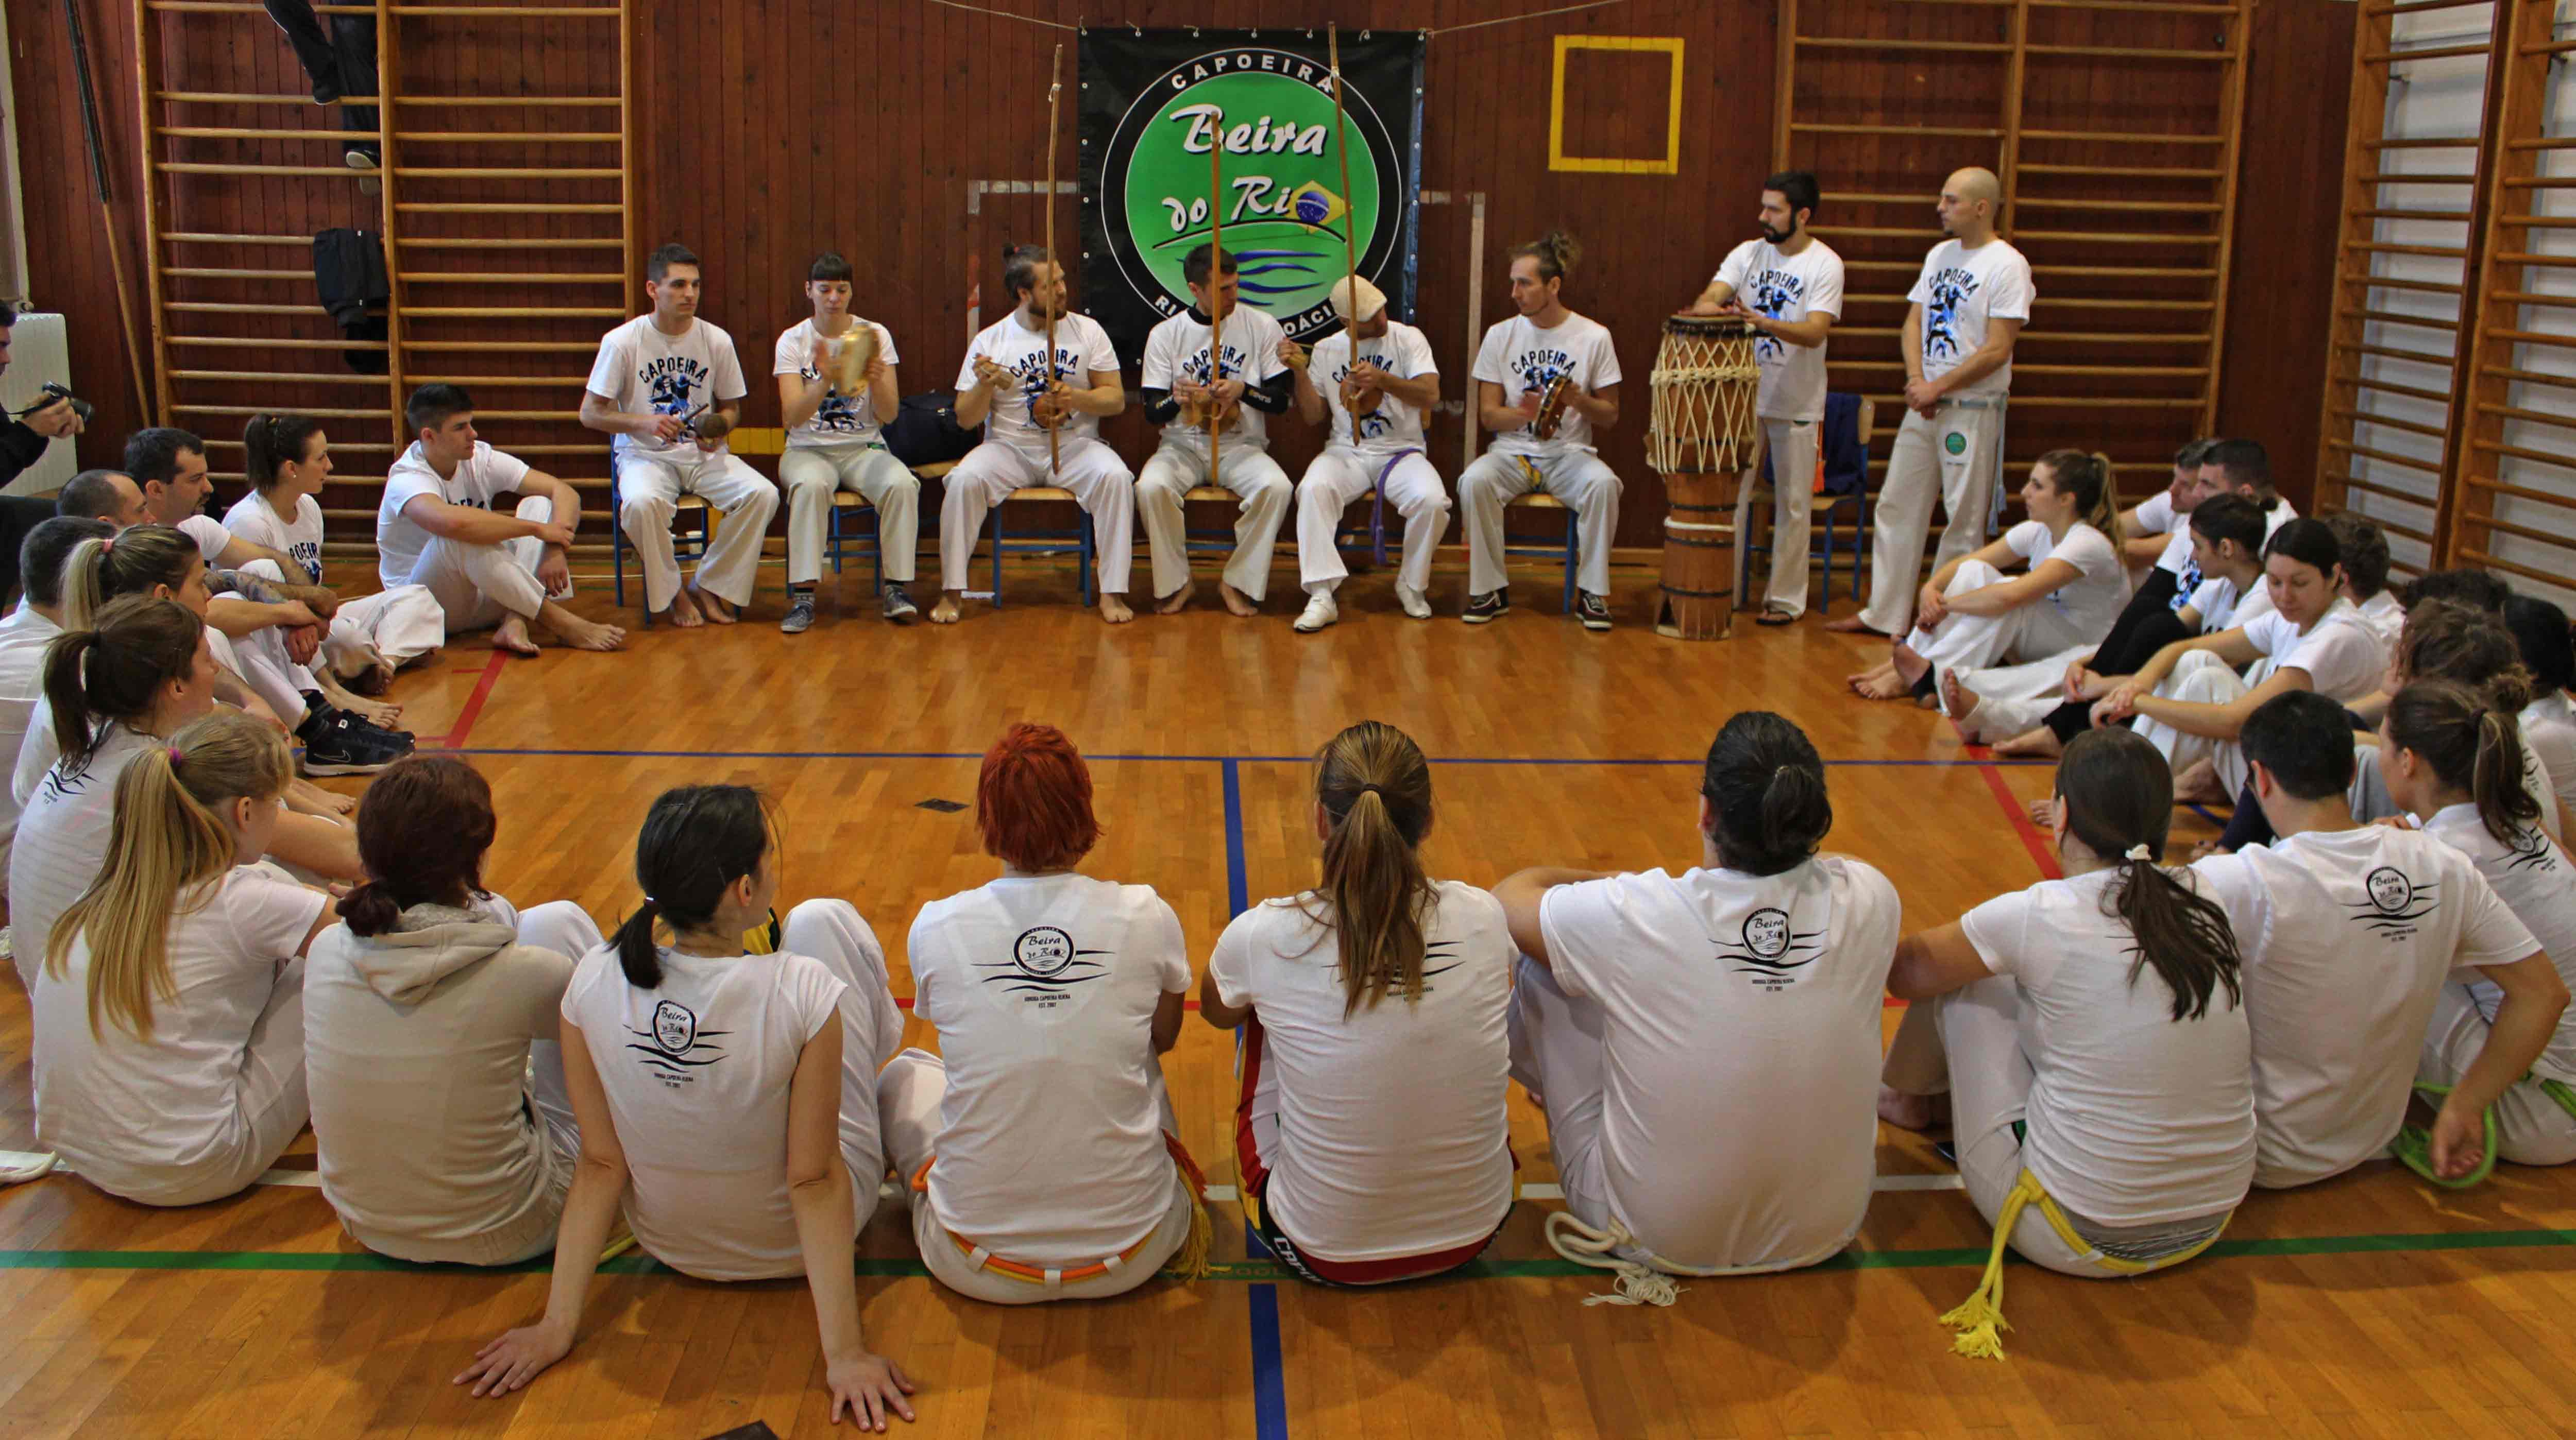 Batizado, Grupa Beira do Rio sjedi u krugu, Capoeira Rijeka